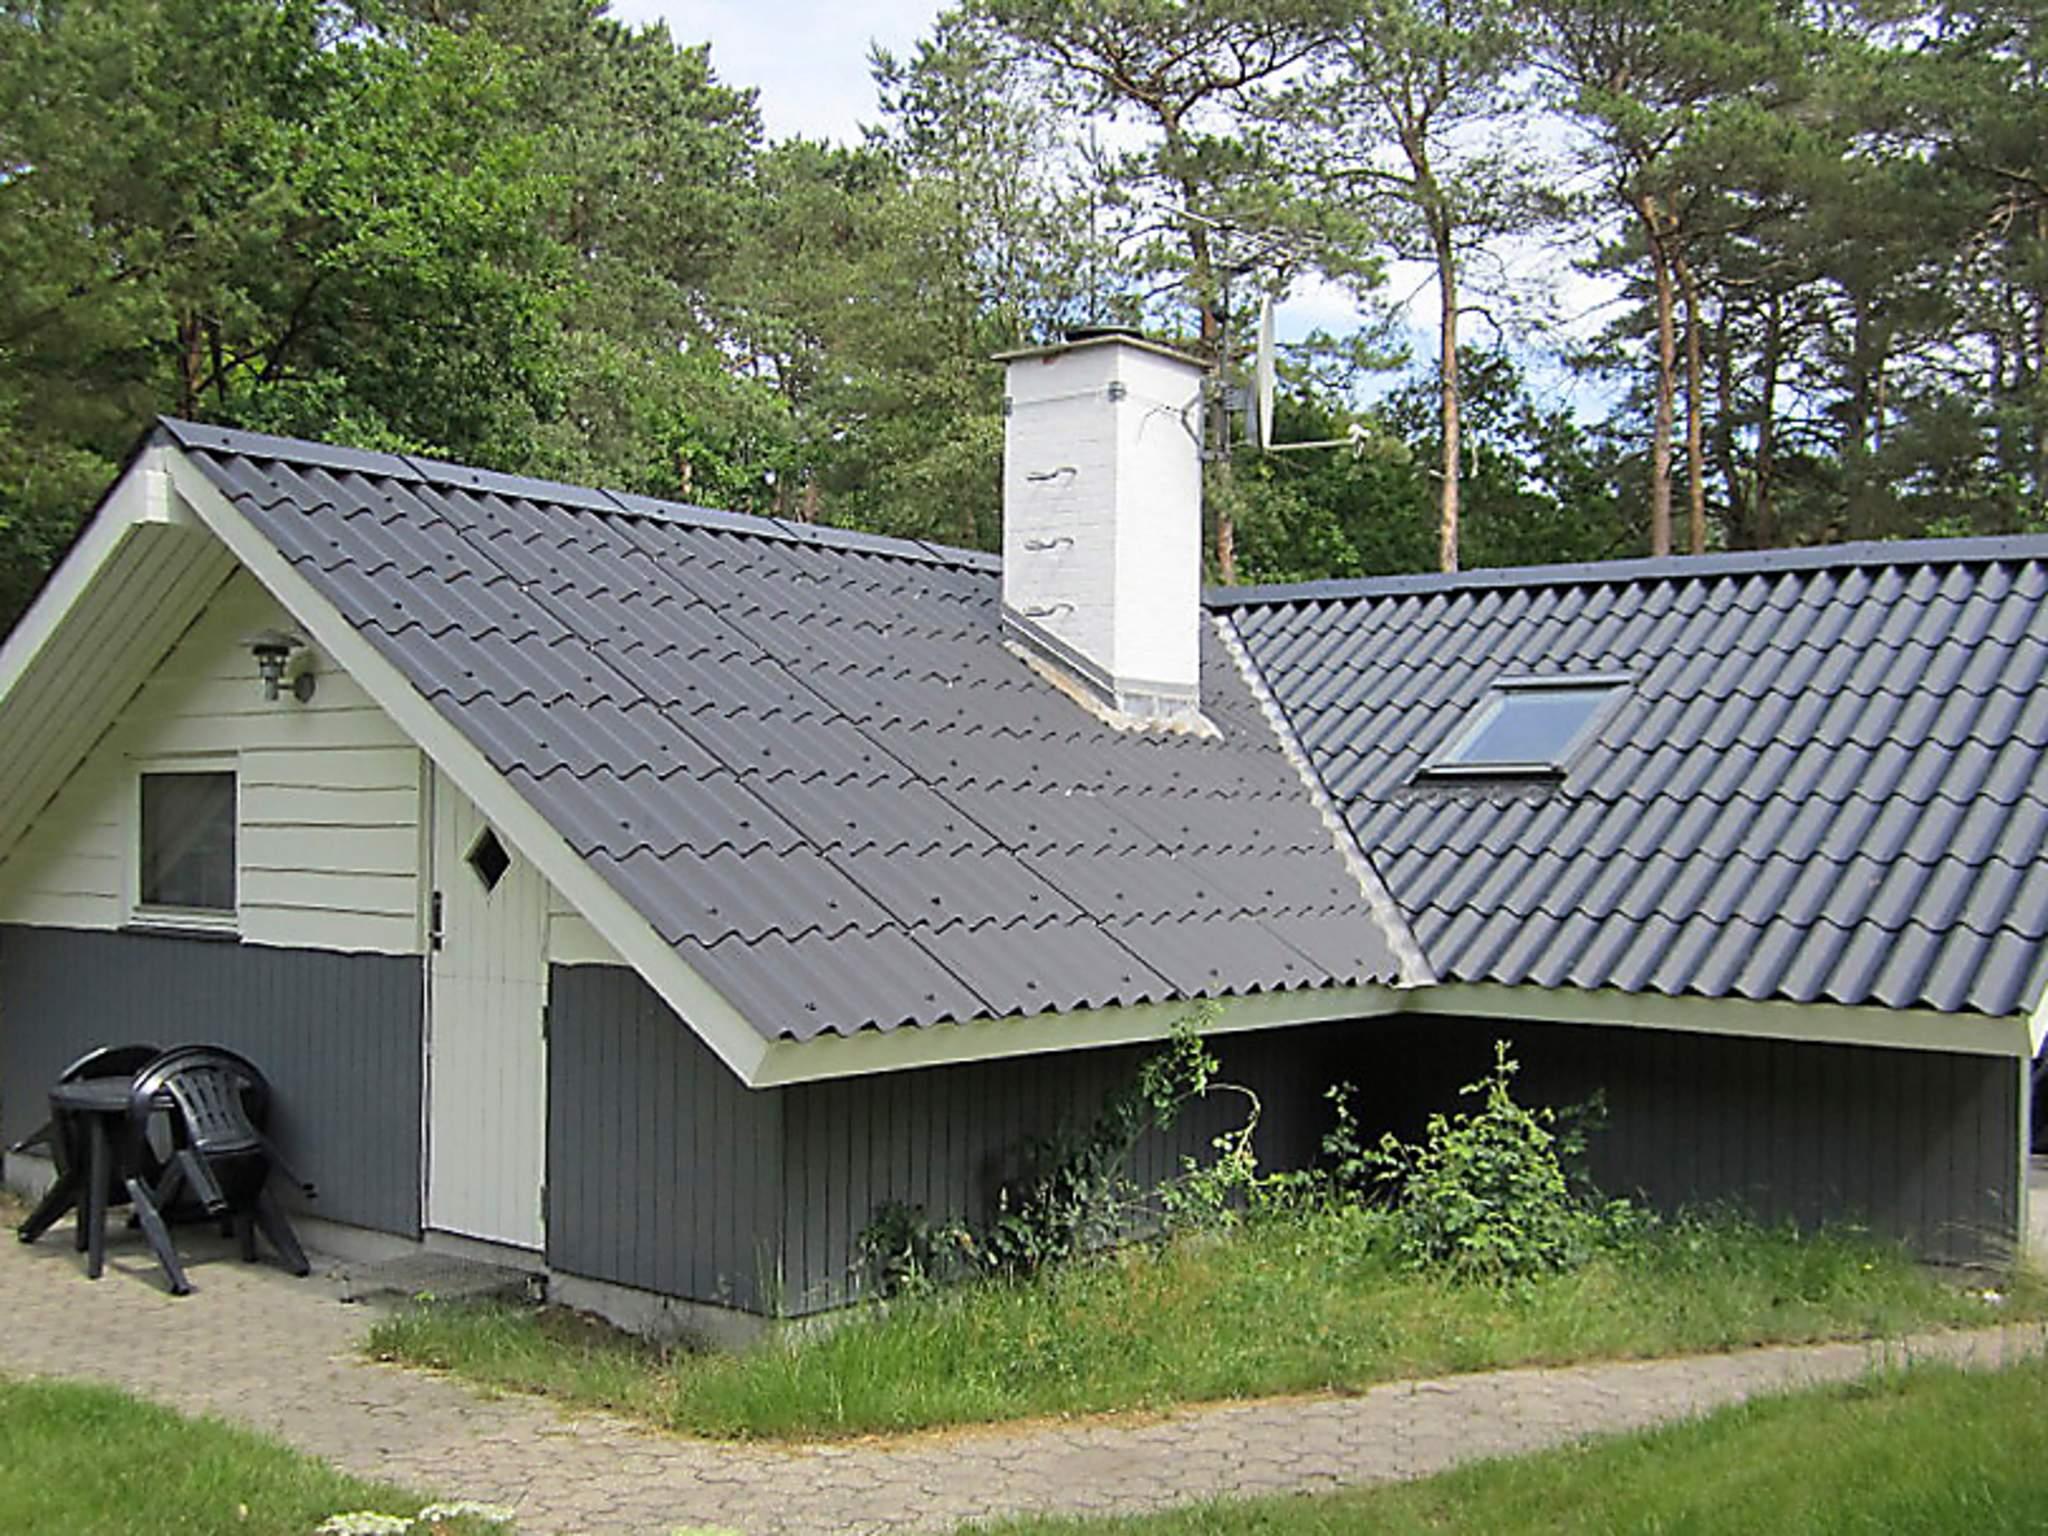 Ferienhaus Hou Nord/Melholt (88048), Hou, , Nordostjütland, Dänemark, Bild 24